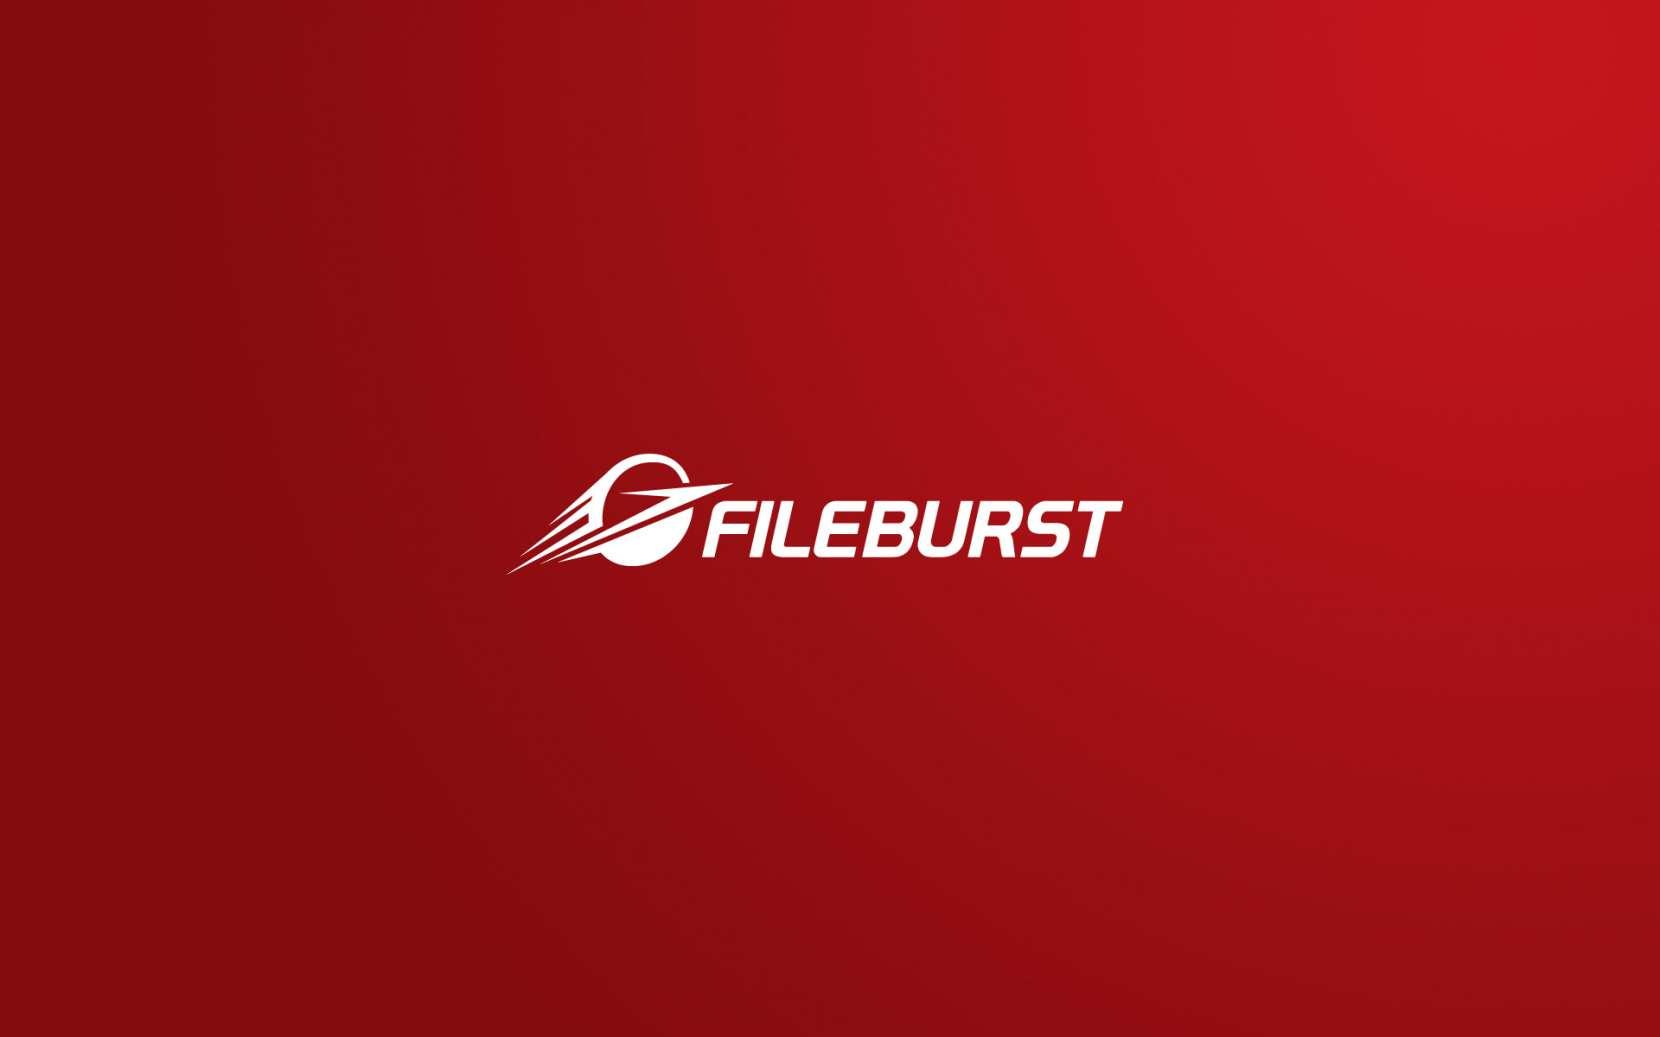 Fileburst2.jpg